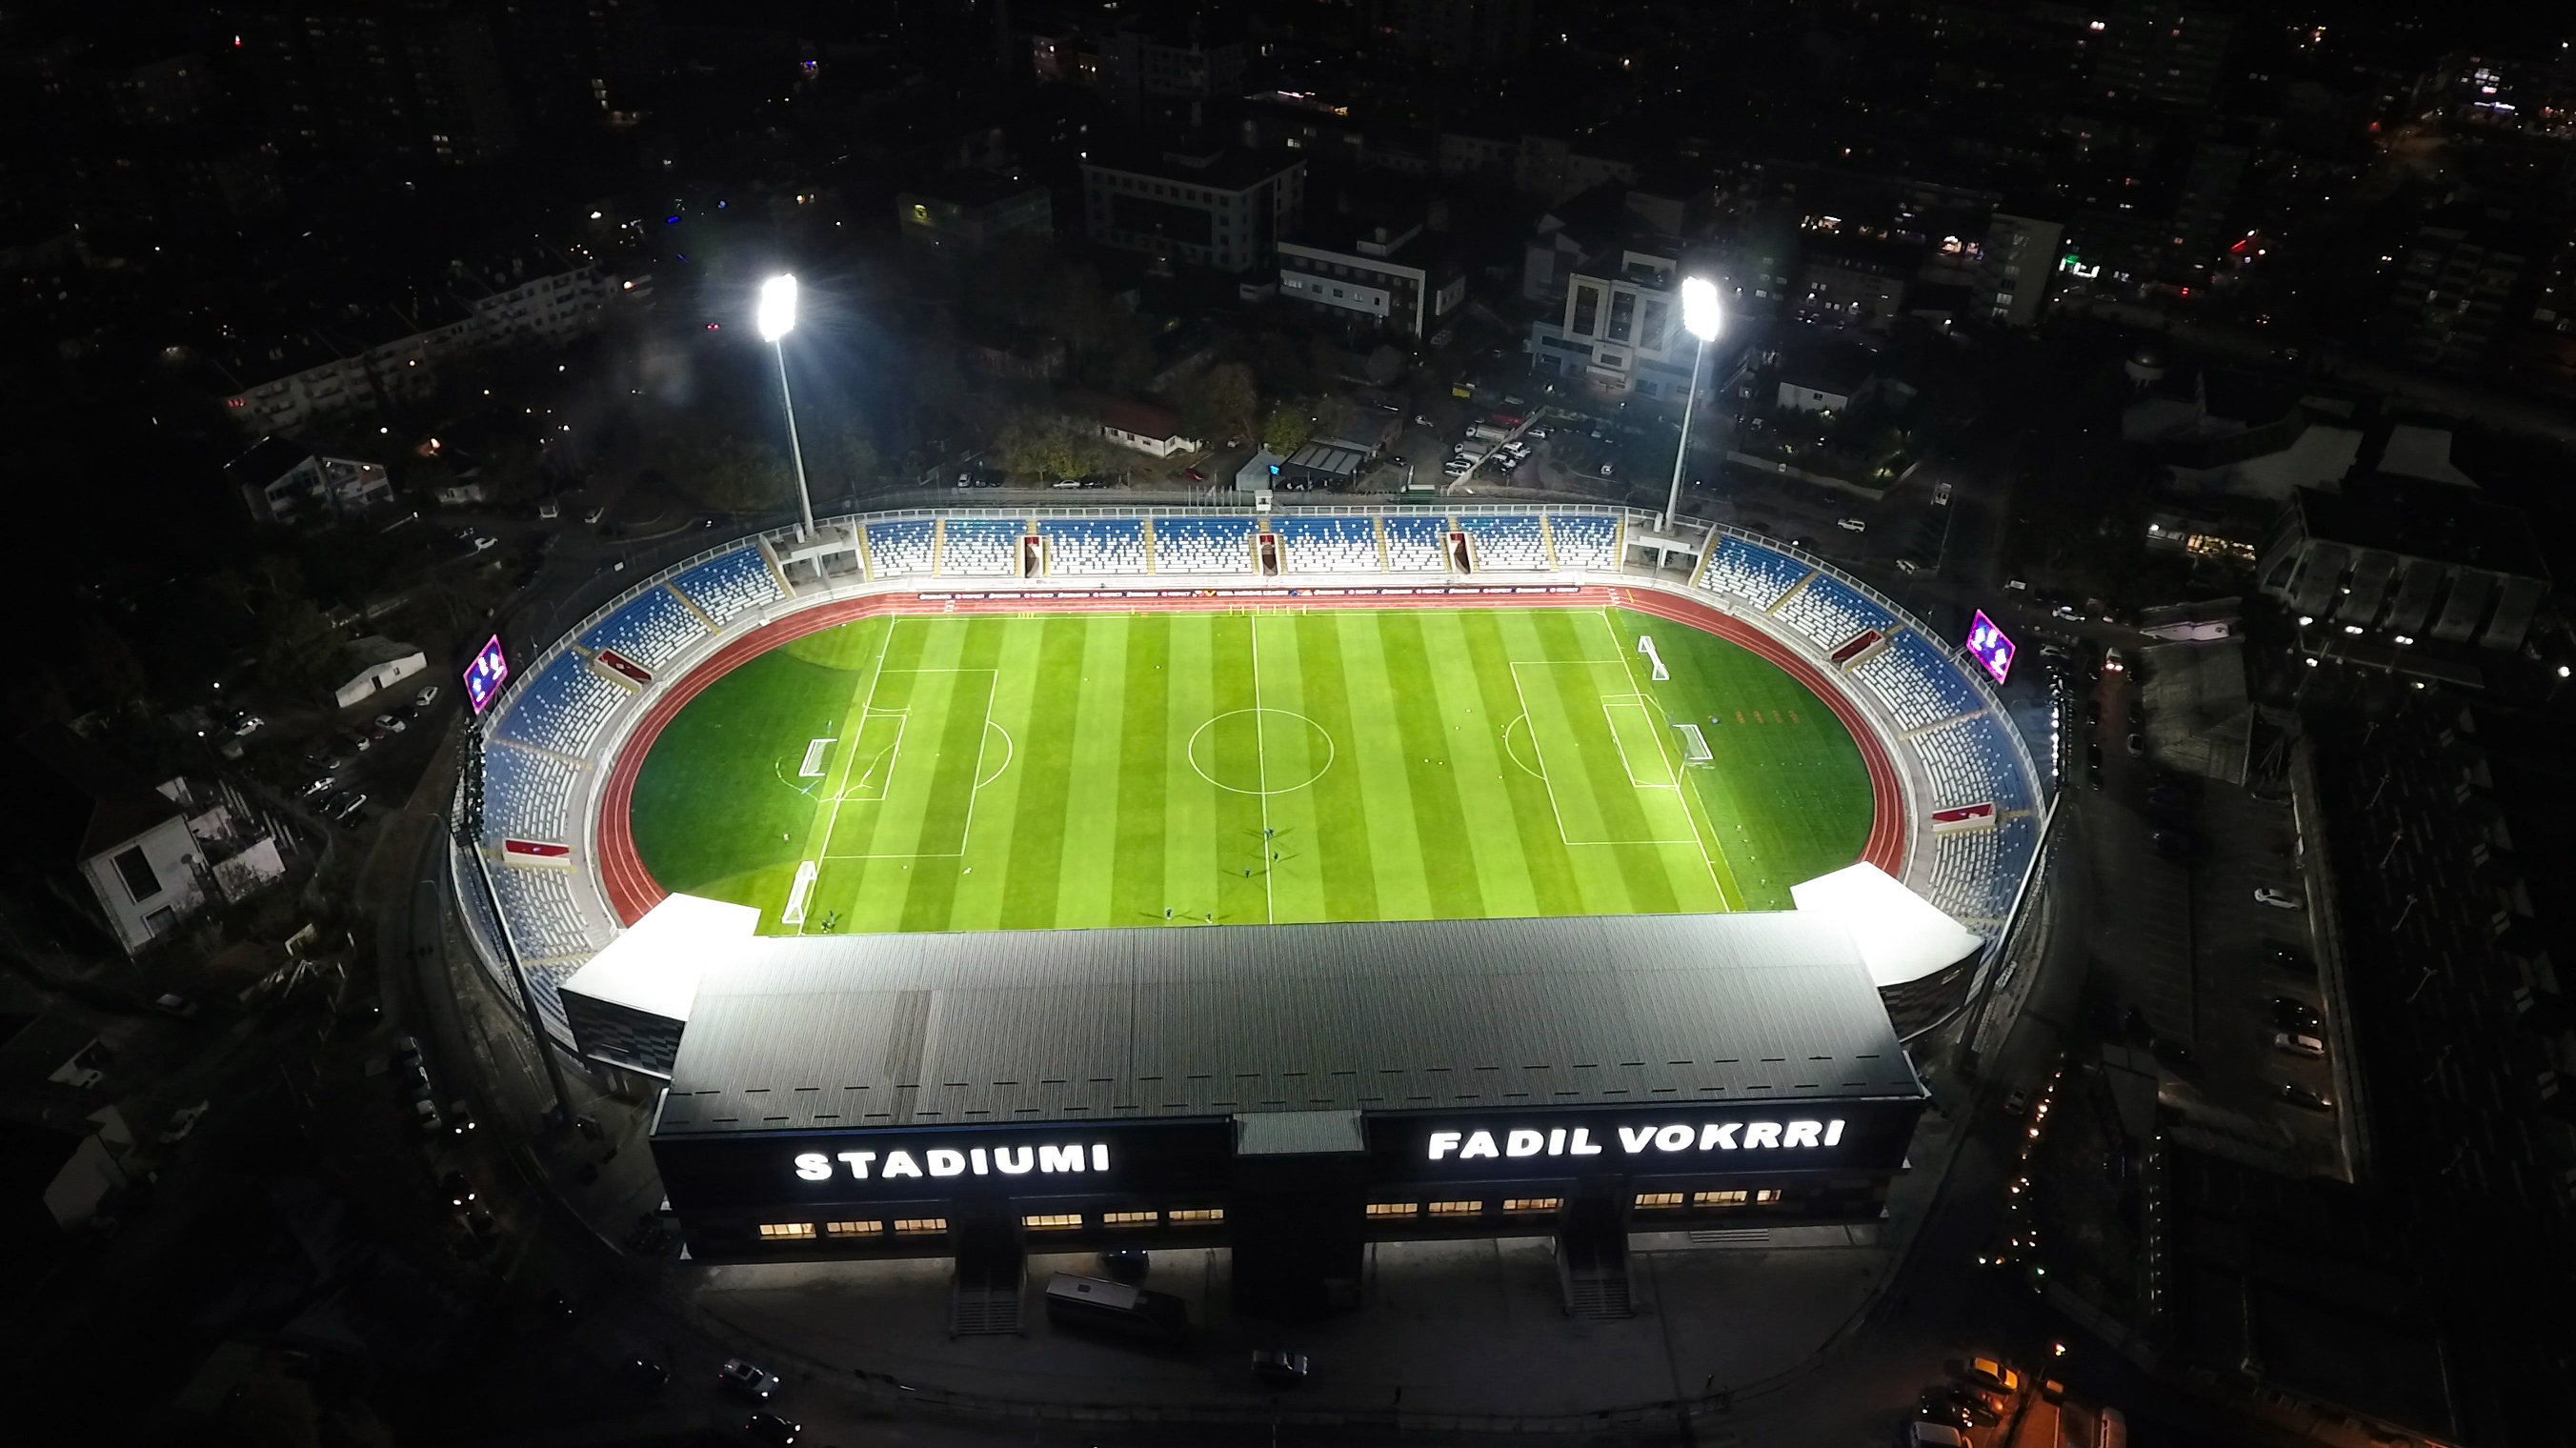 kosovo faces azerbaijan in decisive football match prishtina insight